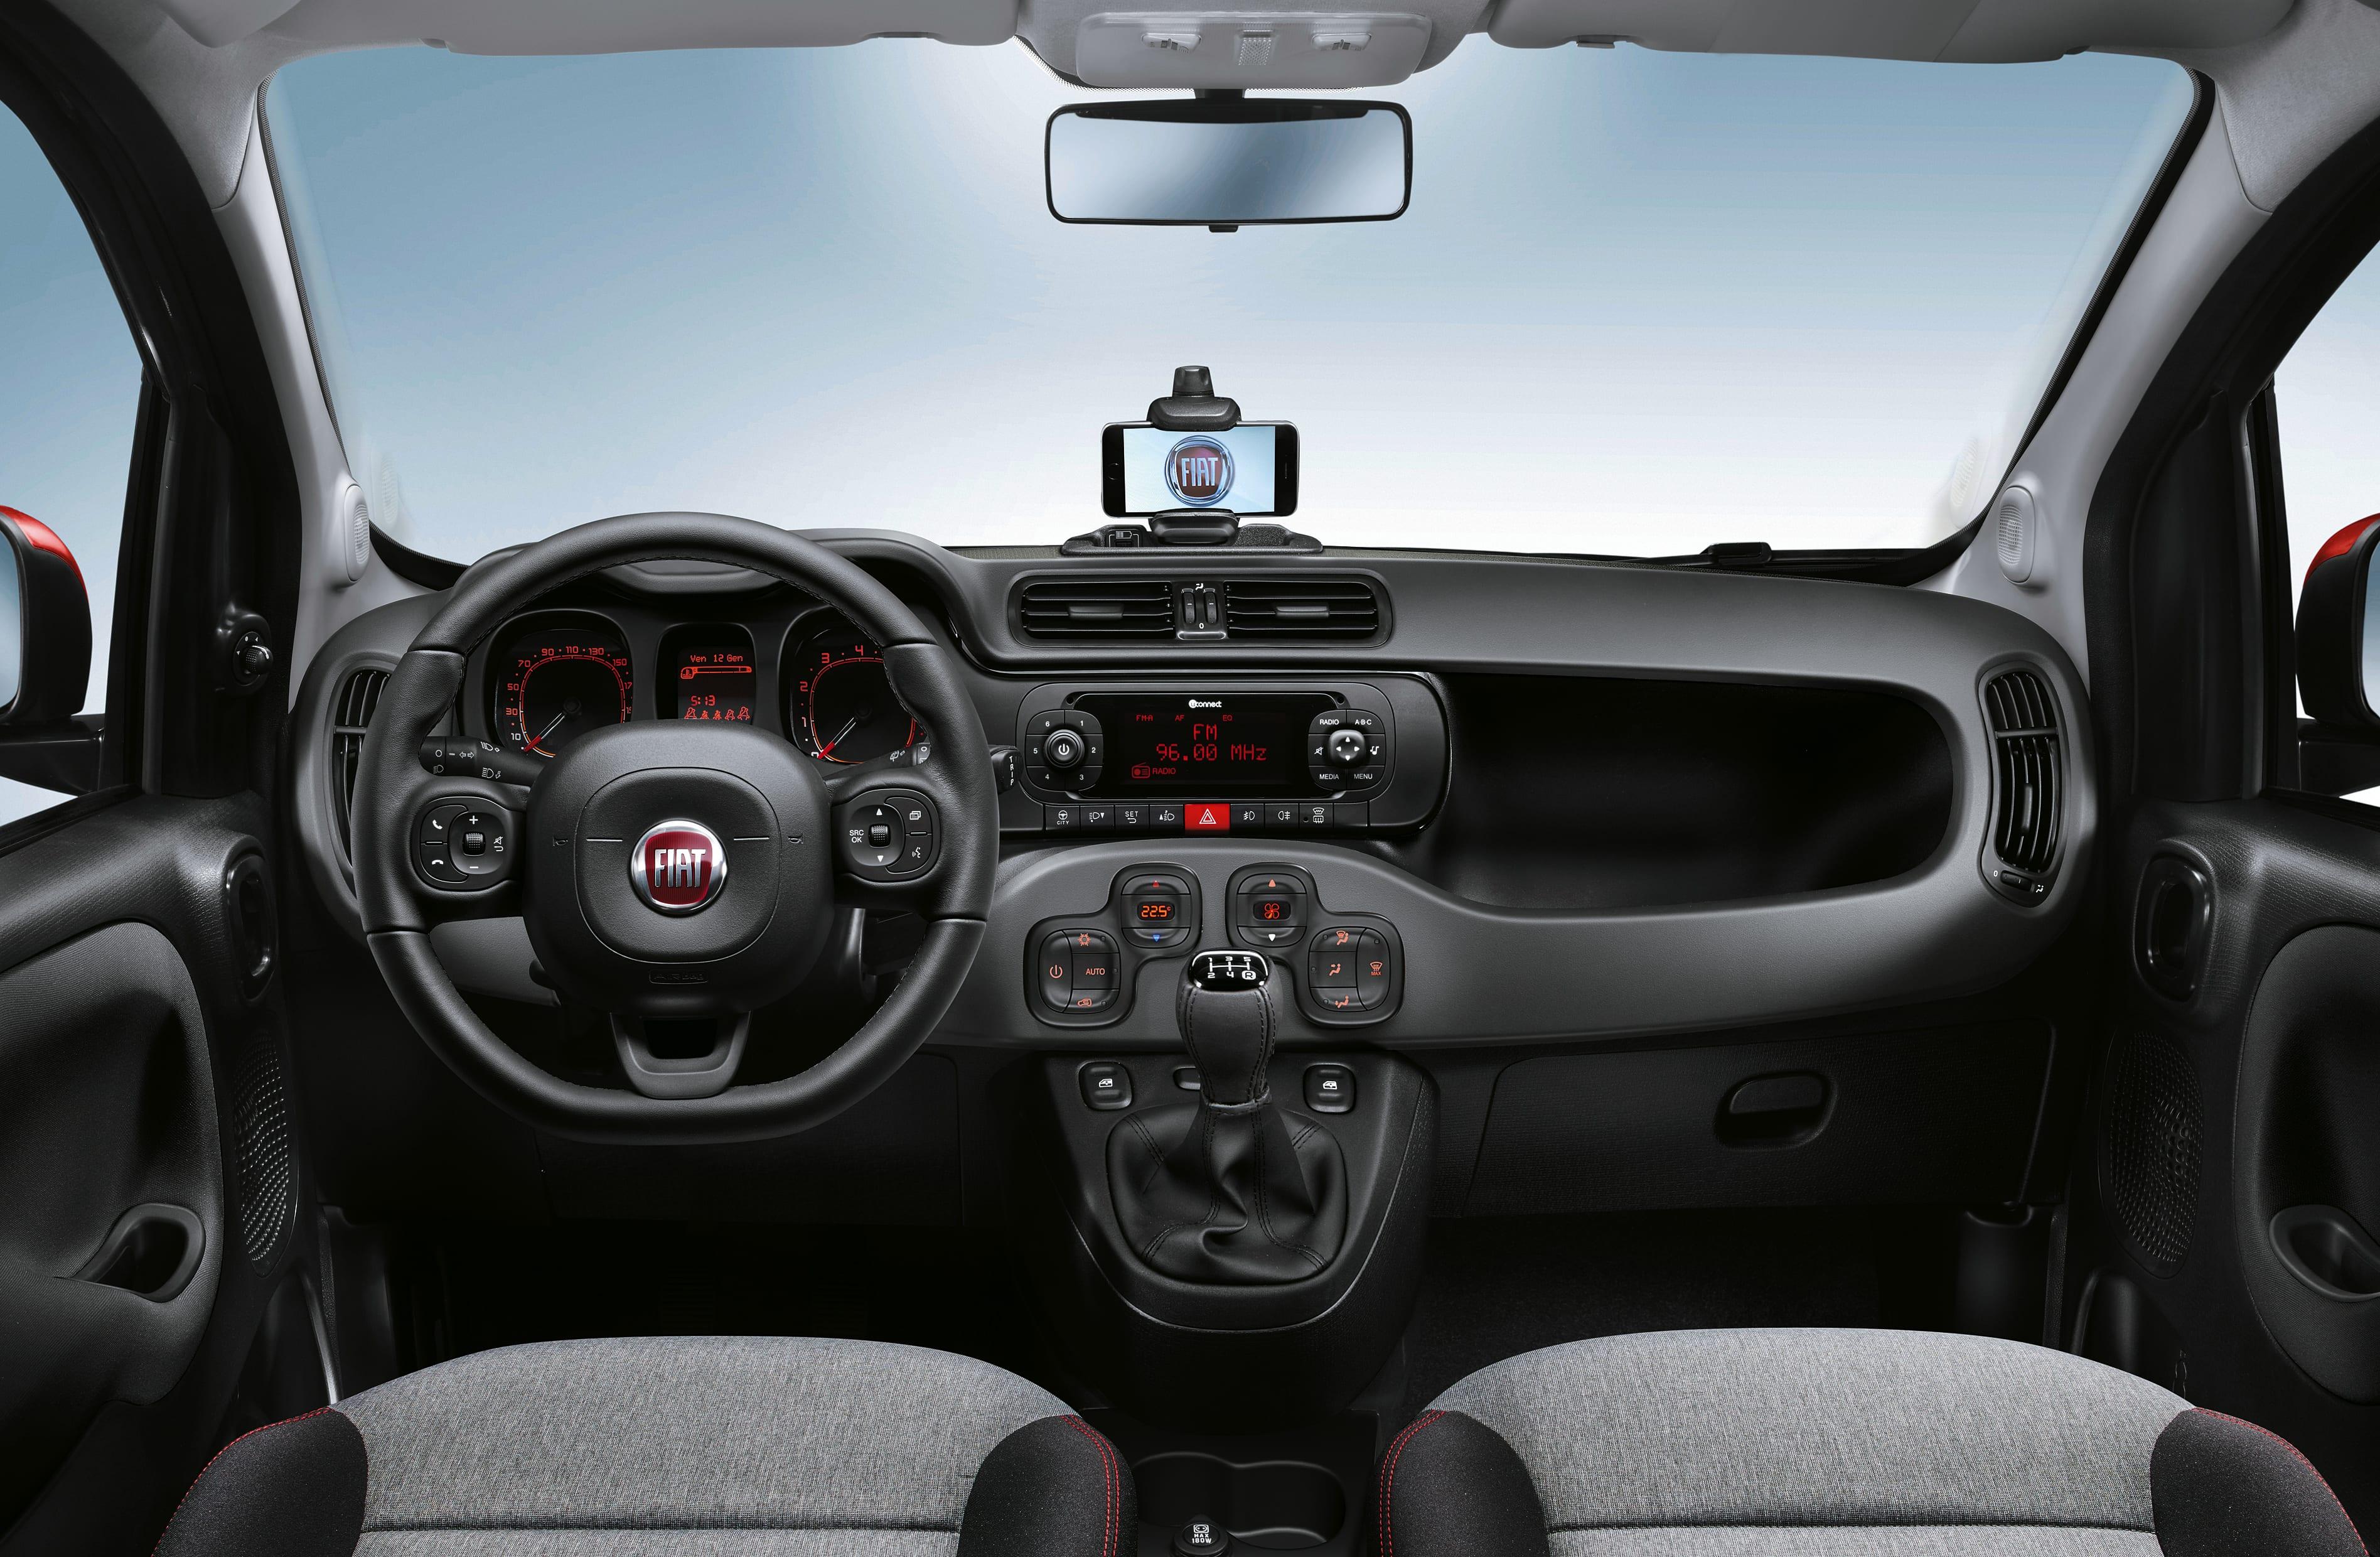 Fiat_Panda dashboard